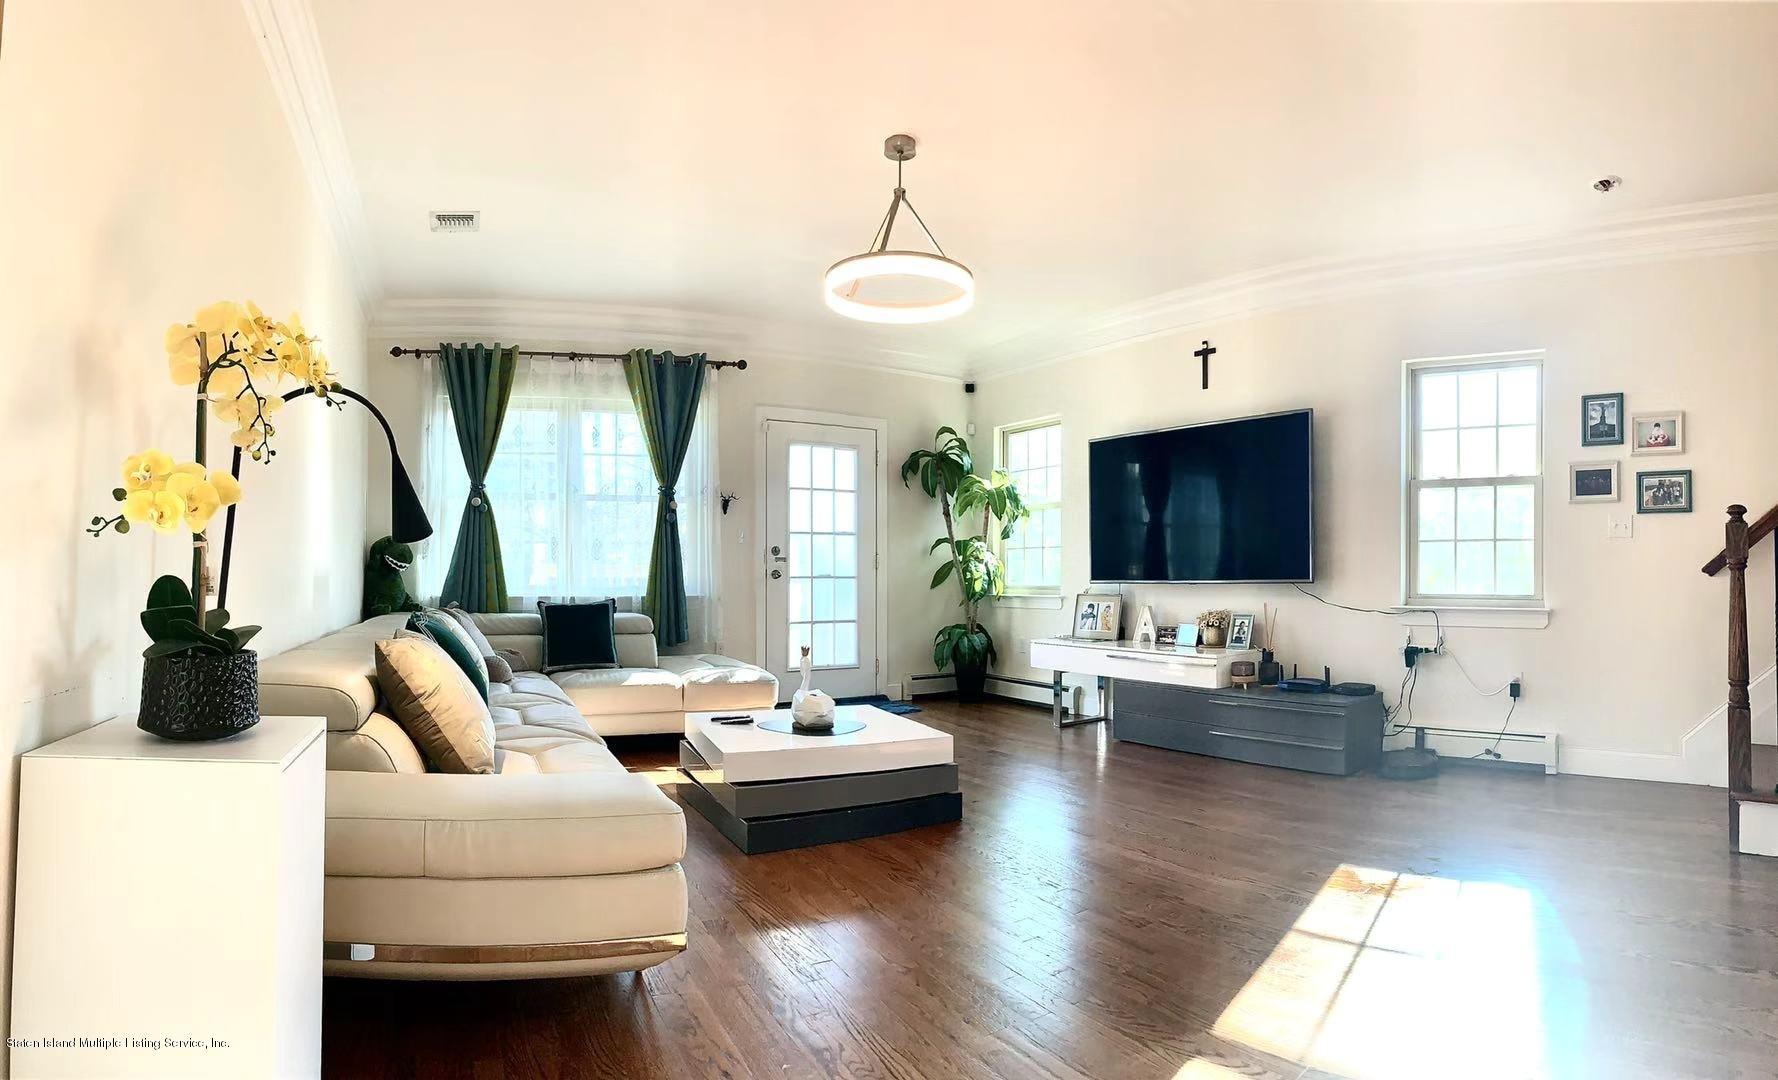 Single Family - Semi-Attached 8 Sweetgum Lane  Staten Island, NY 10314, MLS-1142354-4